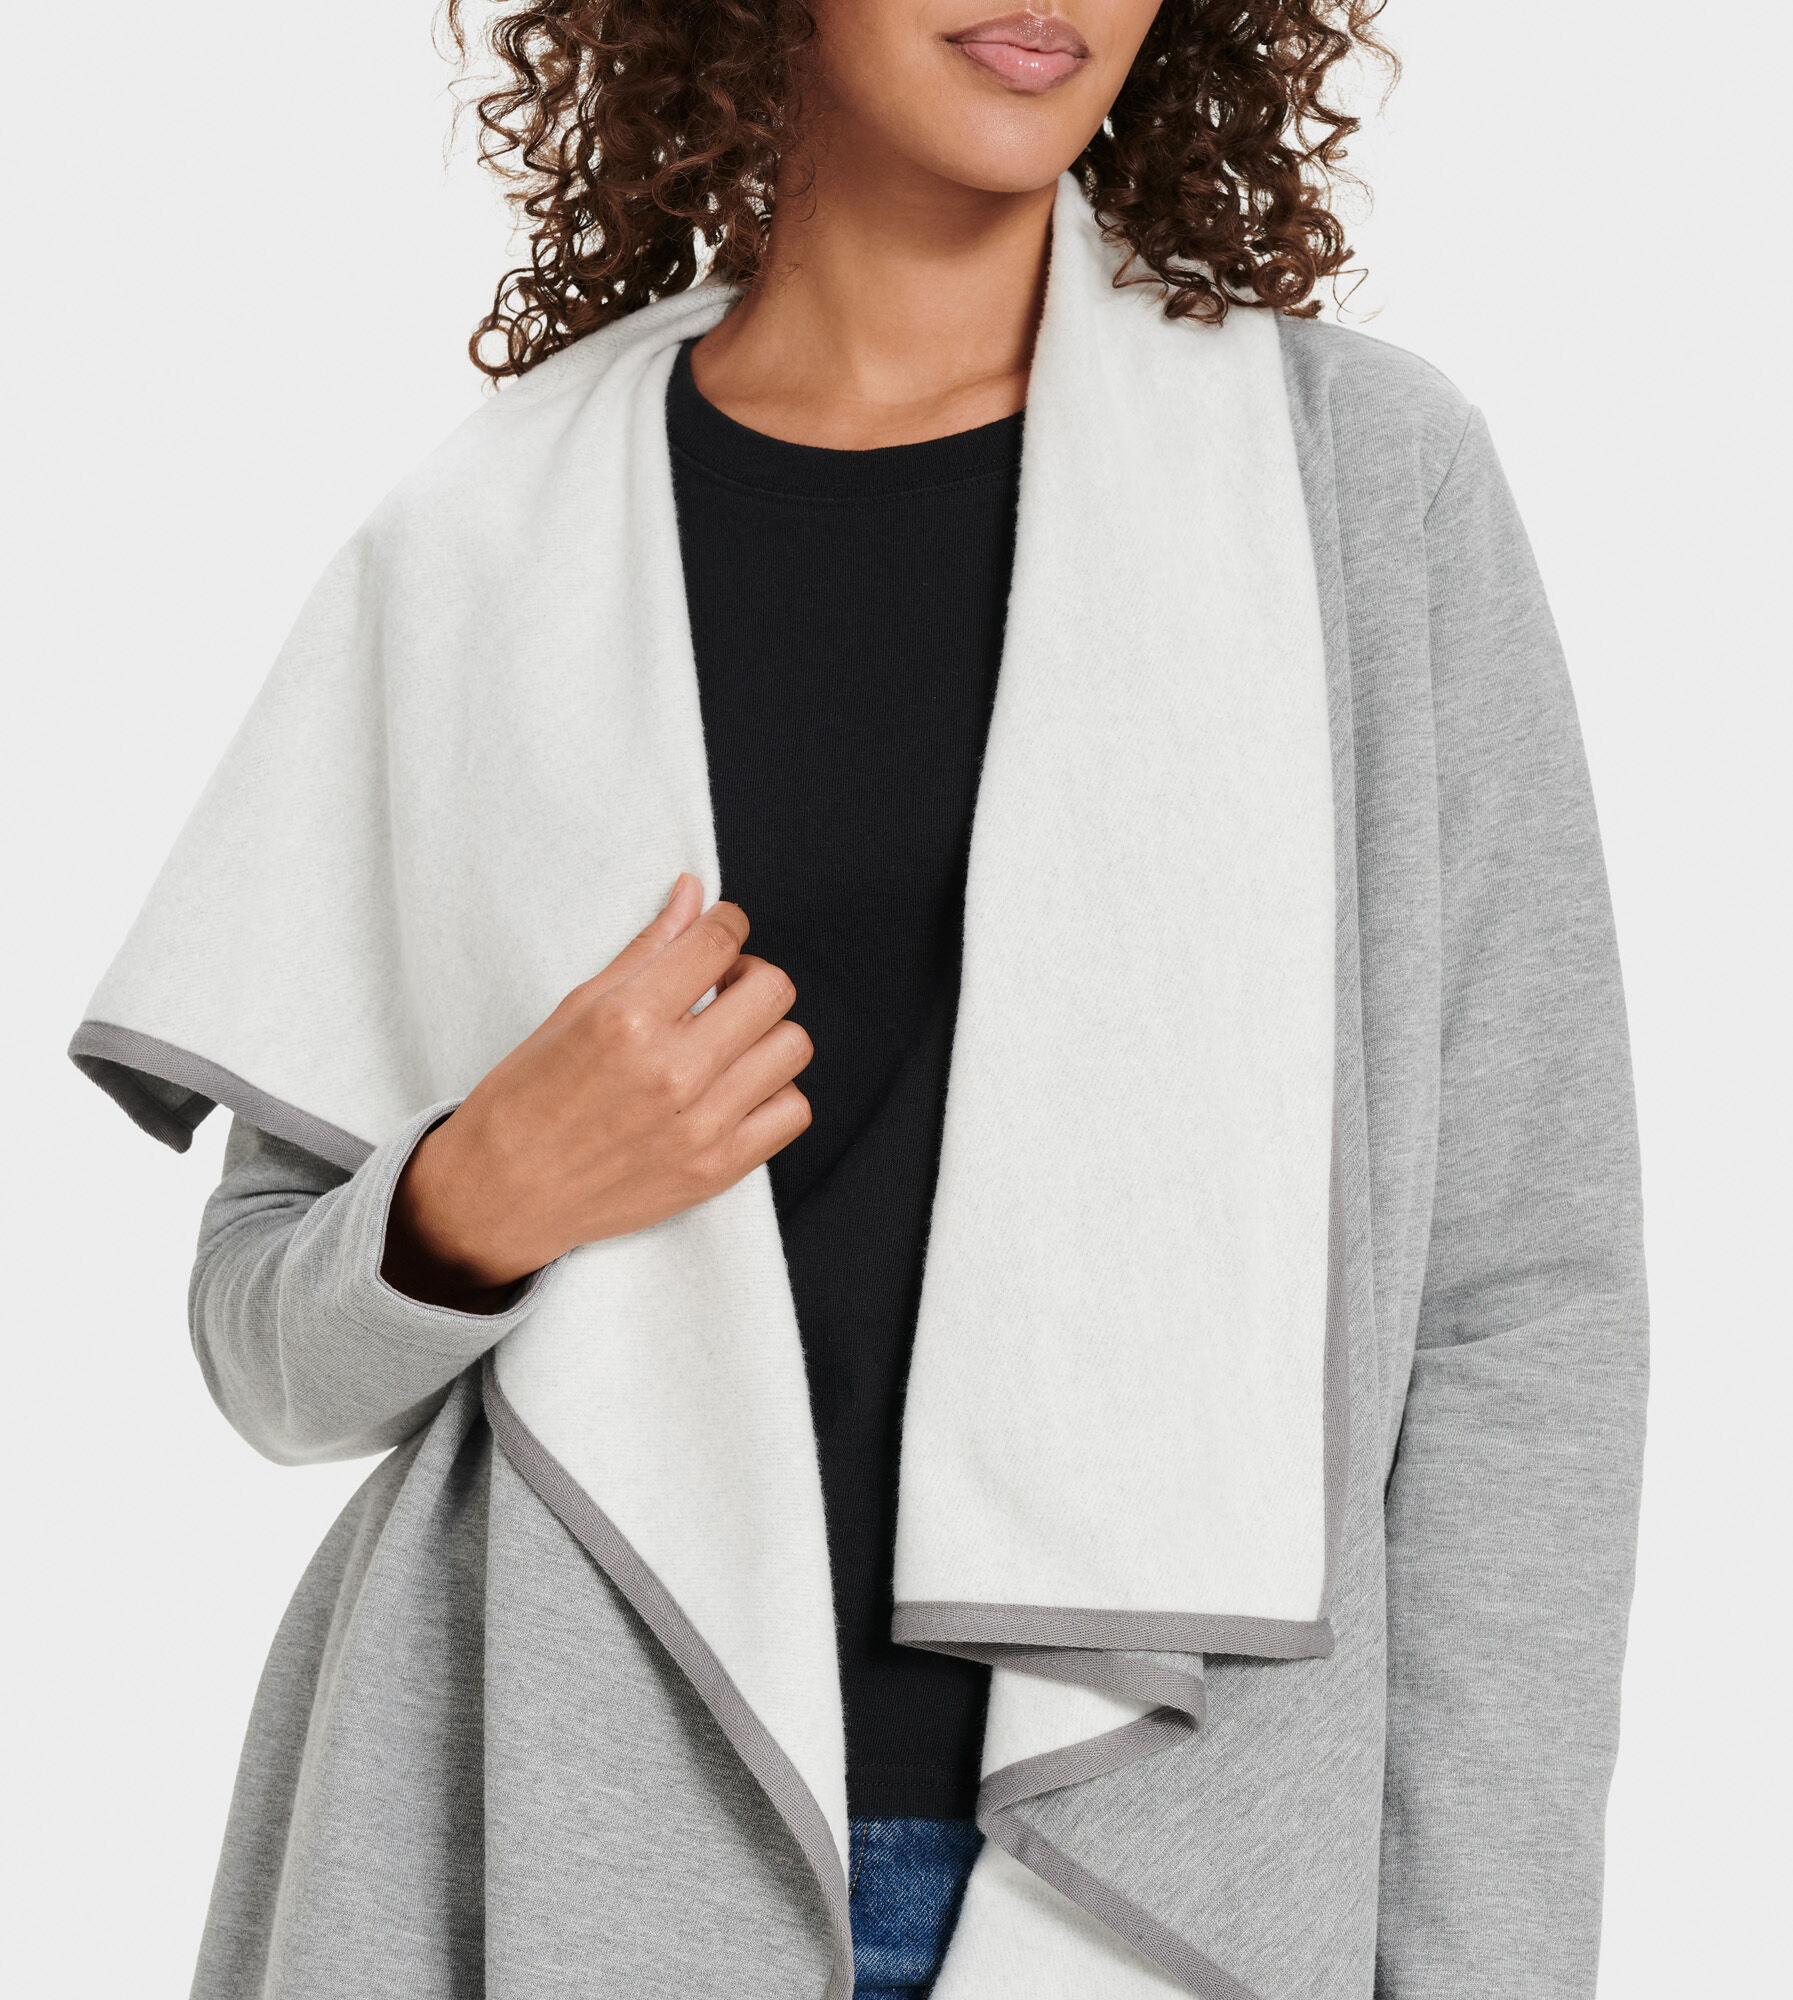 Janni Fleece Blanket Short Boot | UGG®